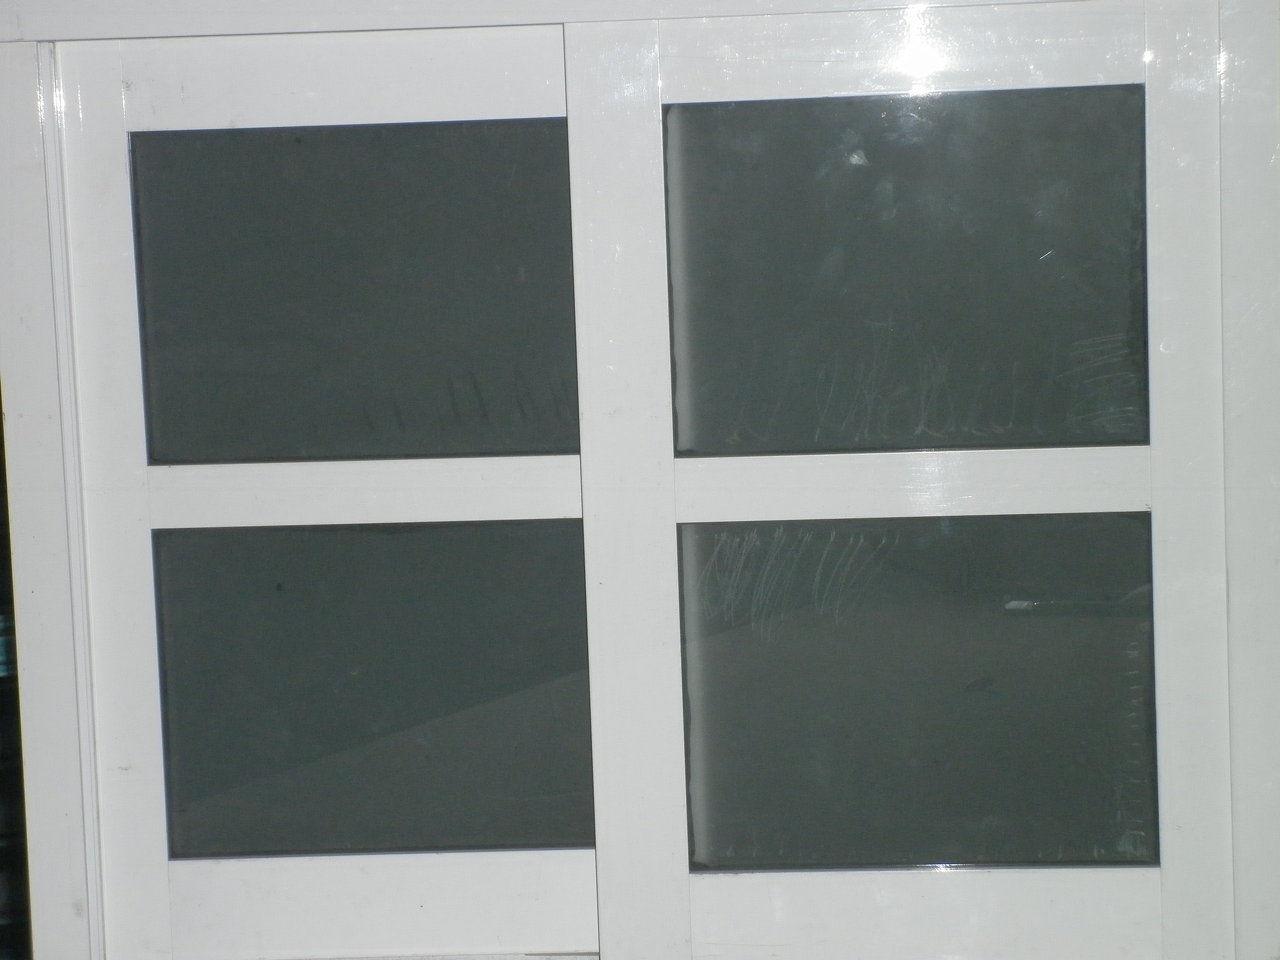 Muebles Para Baño Nezahualcoyotl:Wixcom Taller de vidrio y aluminio created by baldomero_vidrio based